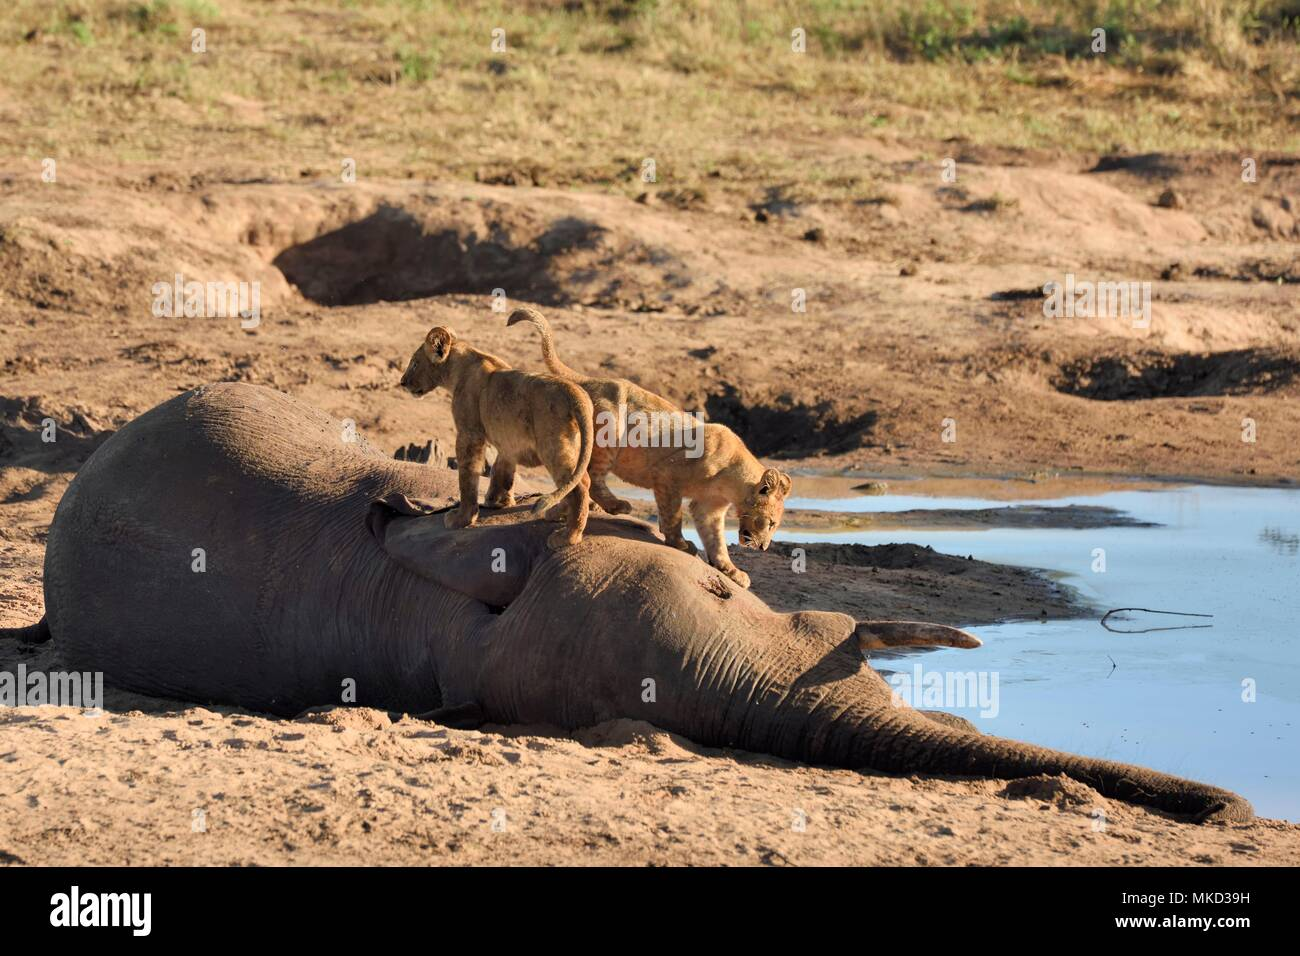 Lion (Panthera leo) Lion cubs on an elephant carcass, Botswana - Stock Image